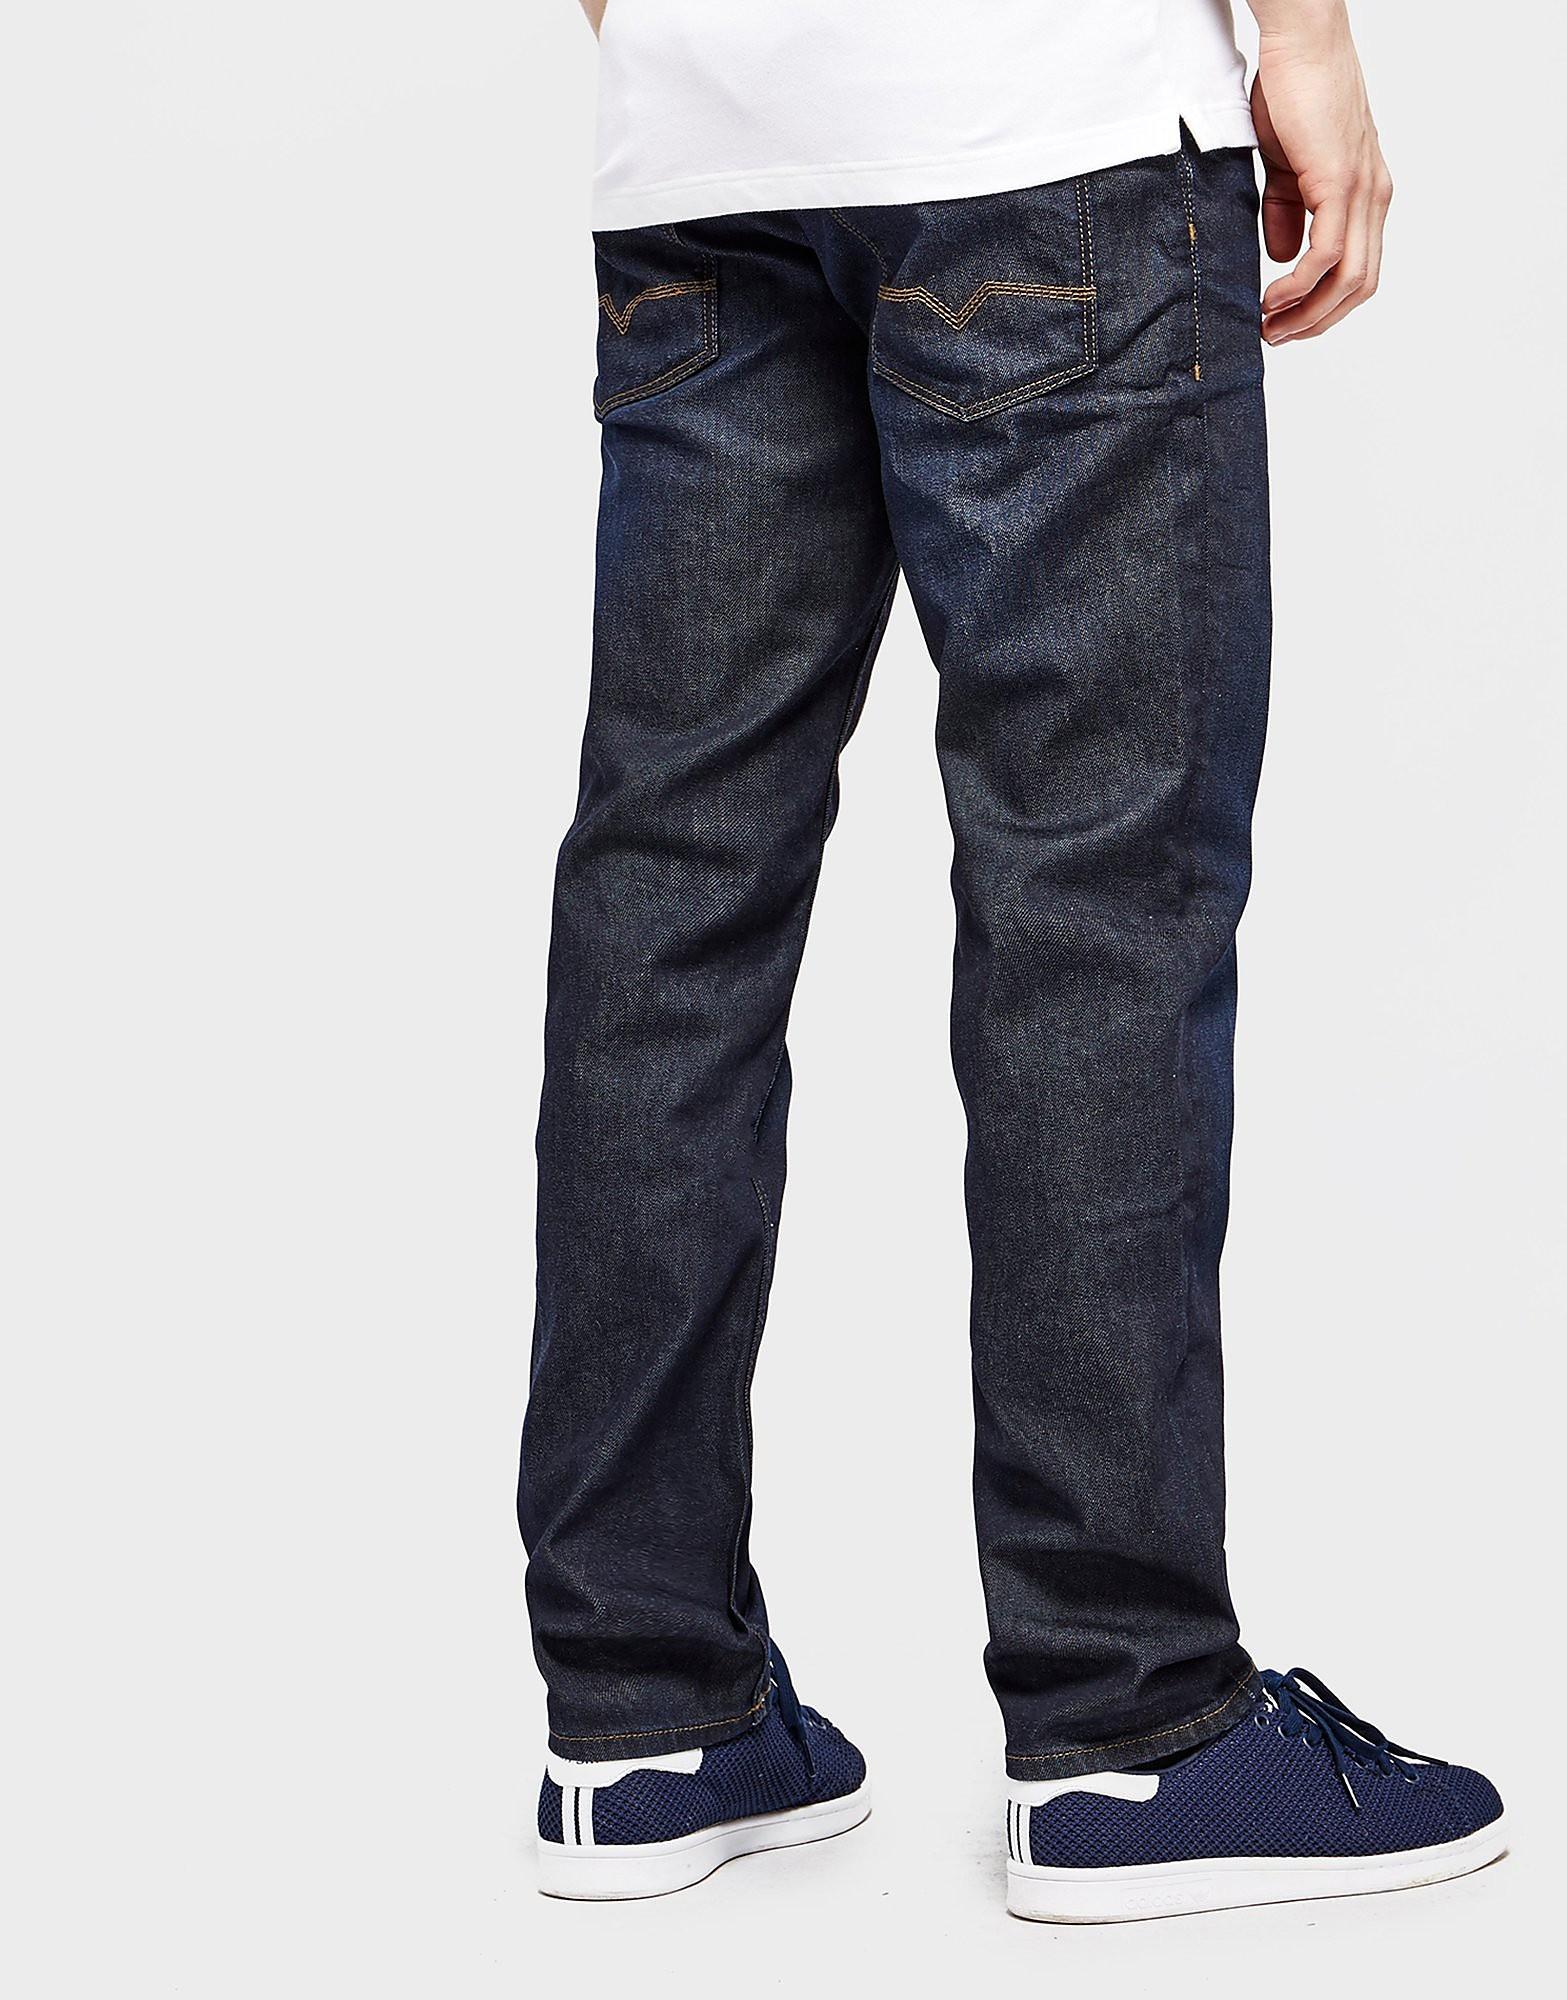 BOSS Orange 63 Slim Fit Jean